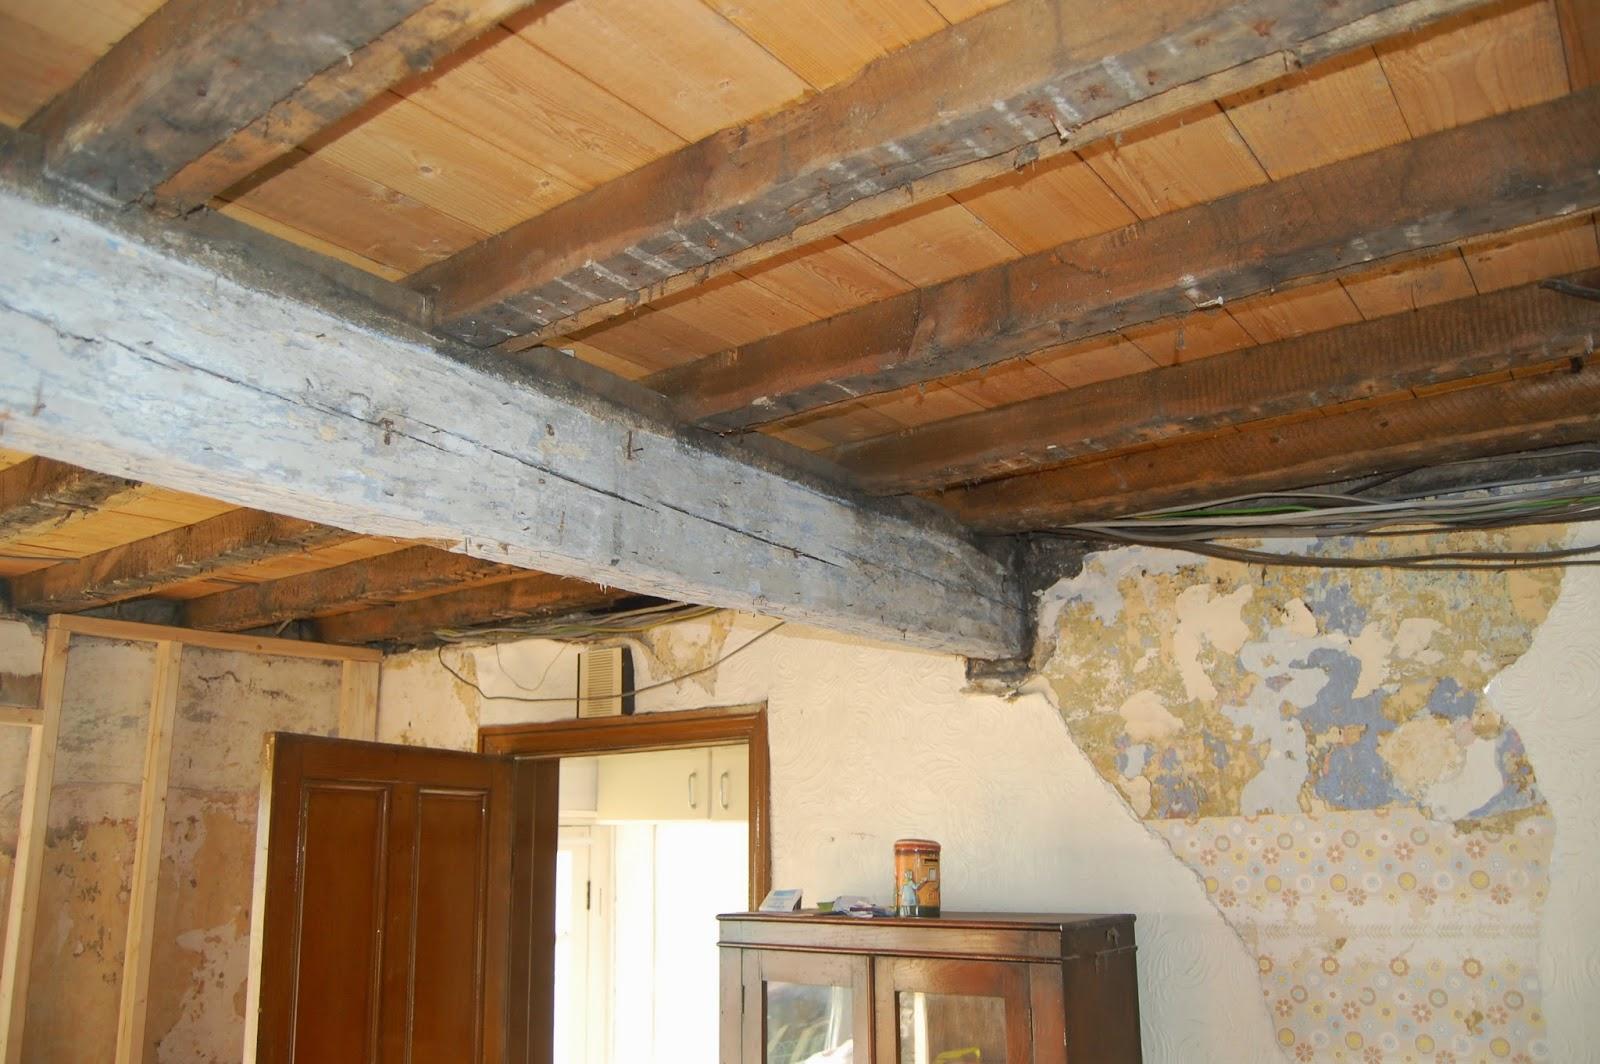 Old beams, new life for them #lifeonpigrow